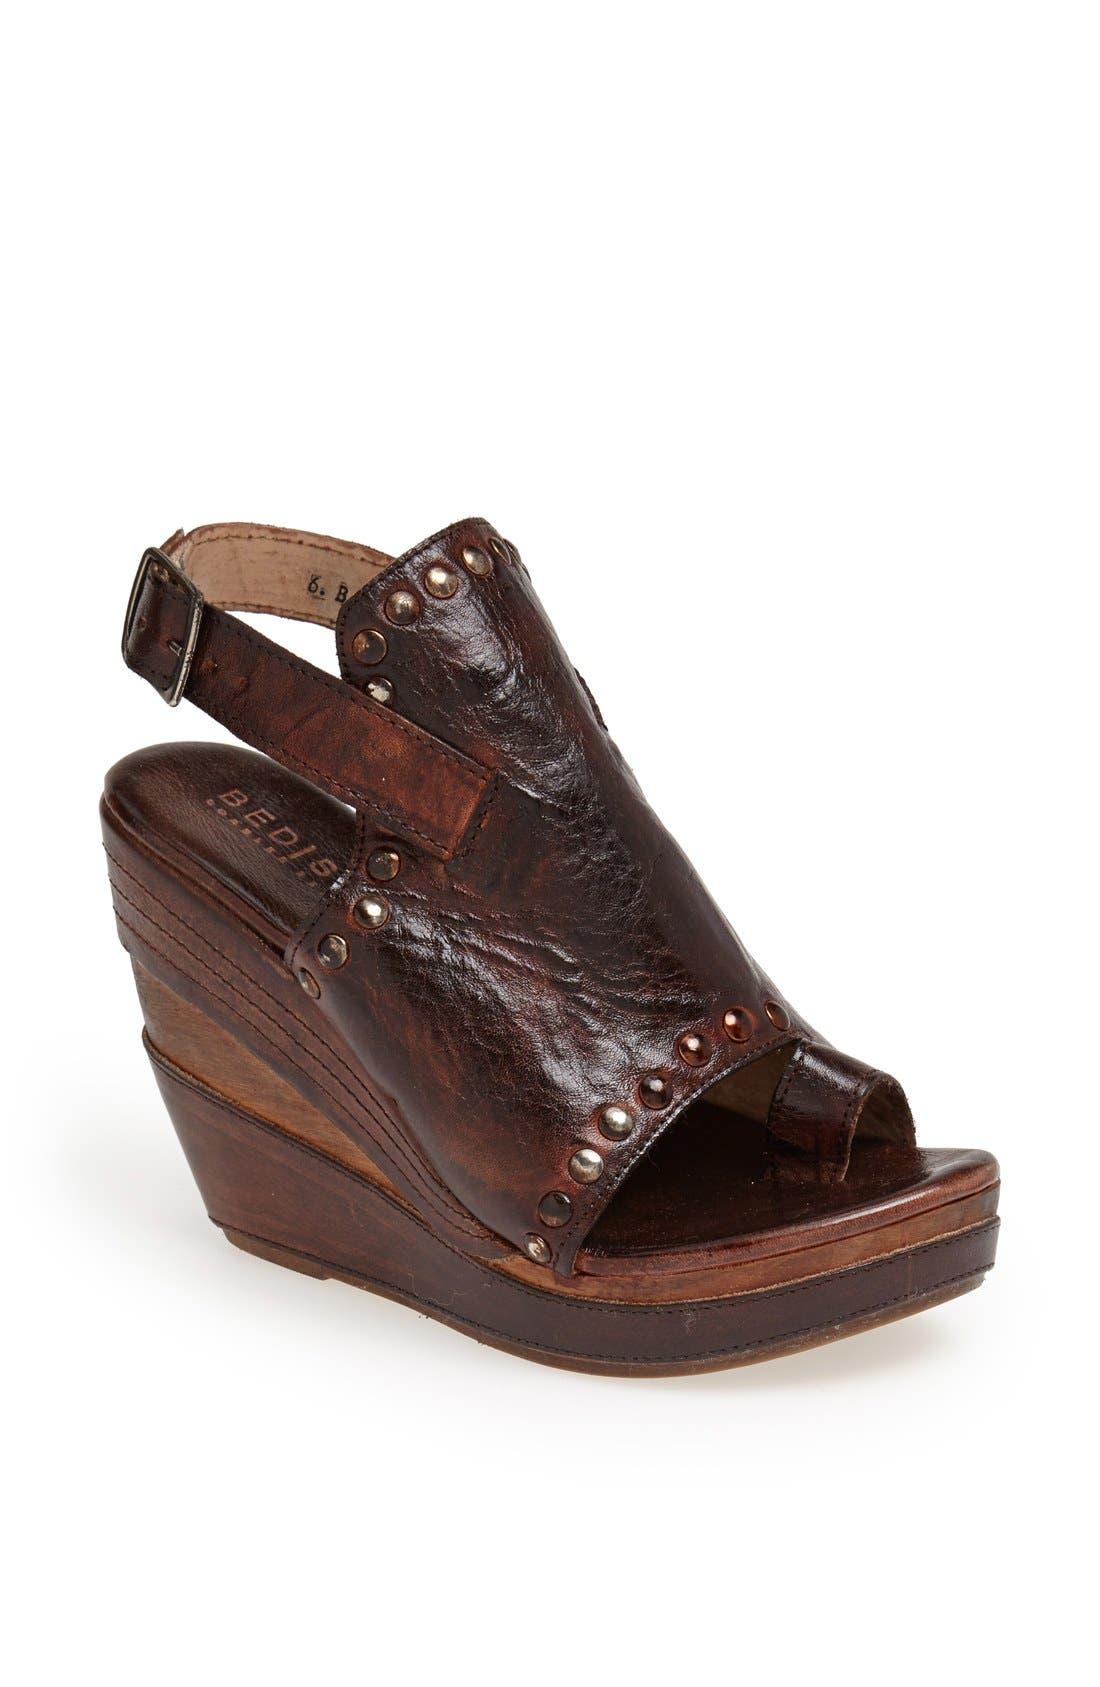 Alternate Image 1 Selected - Bed Stu 'Joann' Leather Sandal